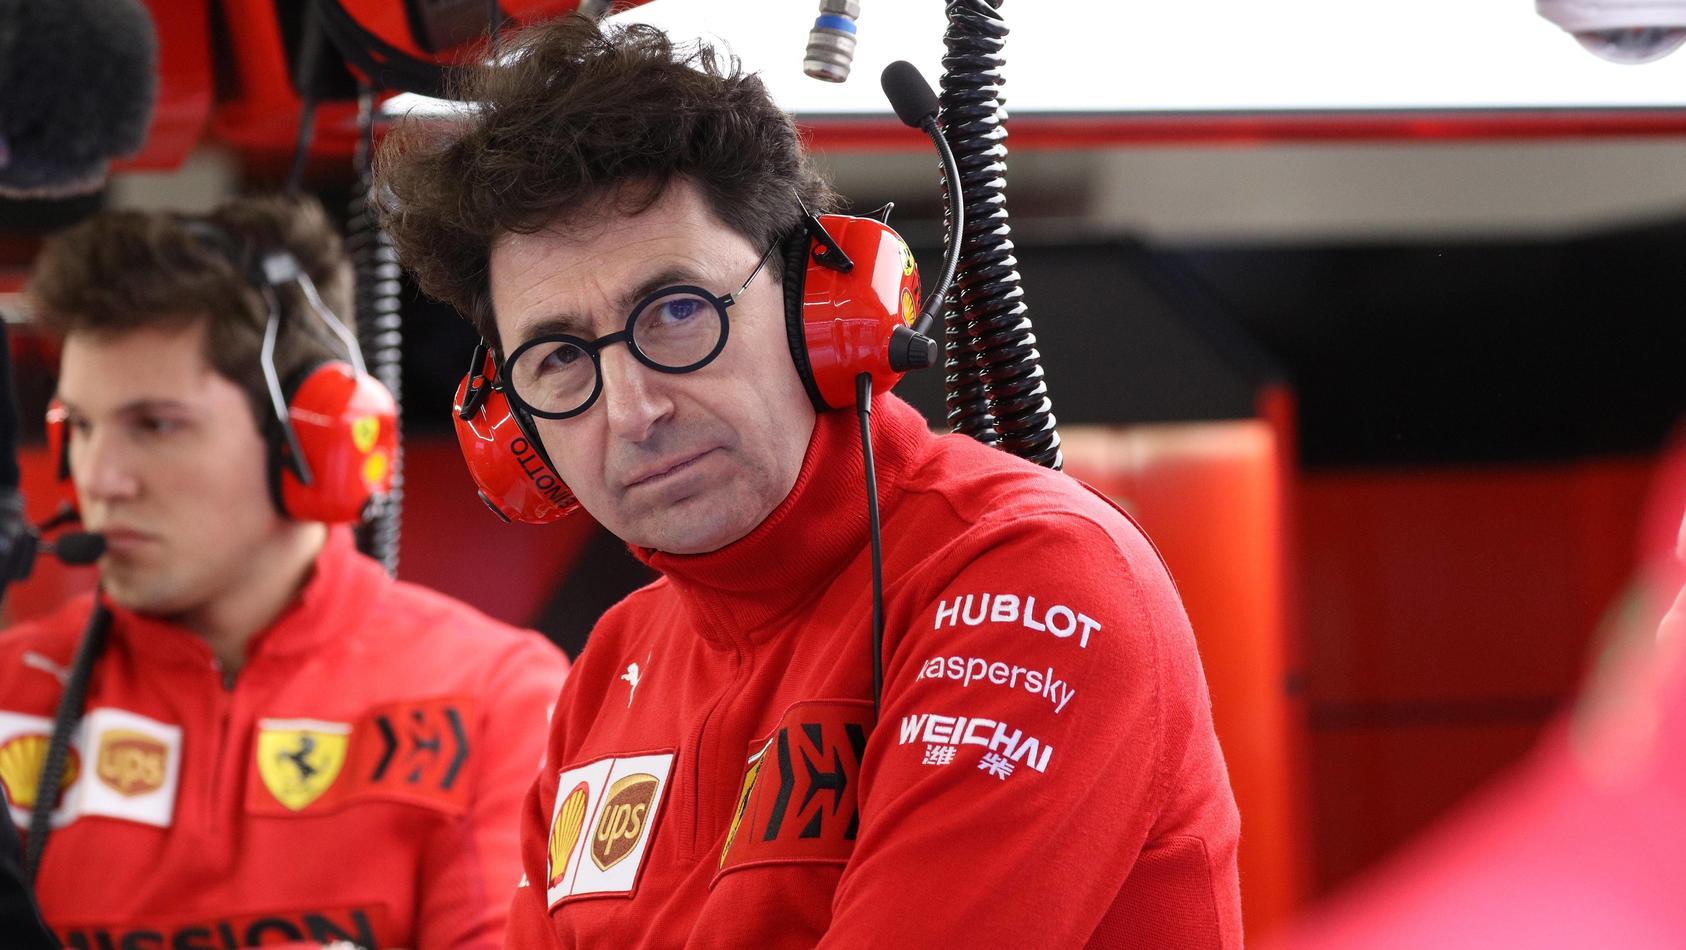 Mattia Binotto will mit Ferrari hoch hinaus